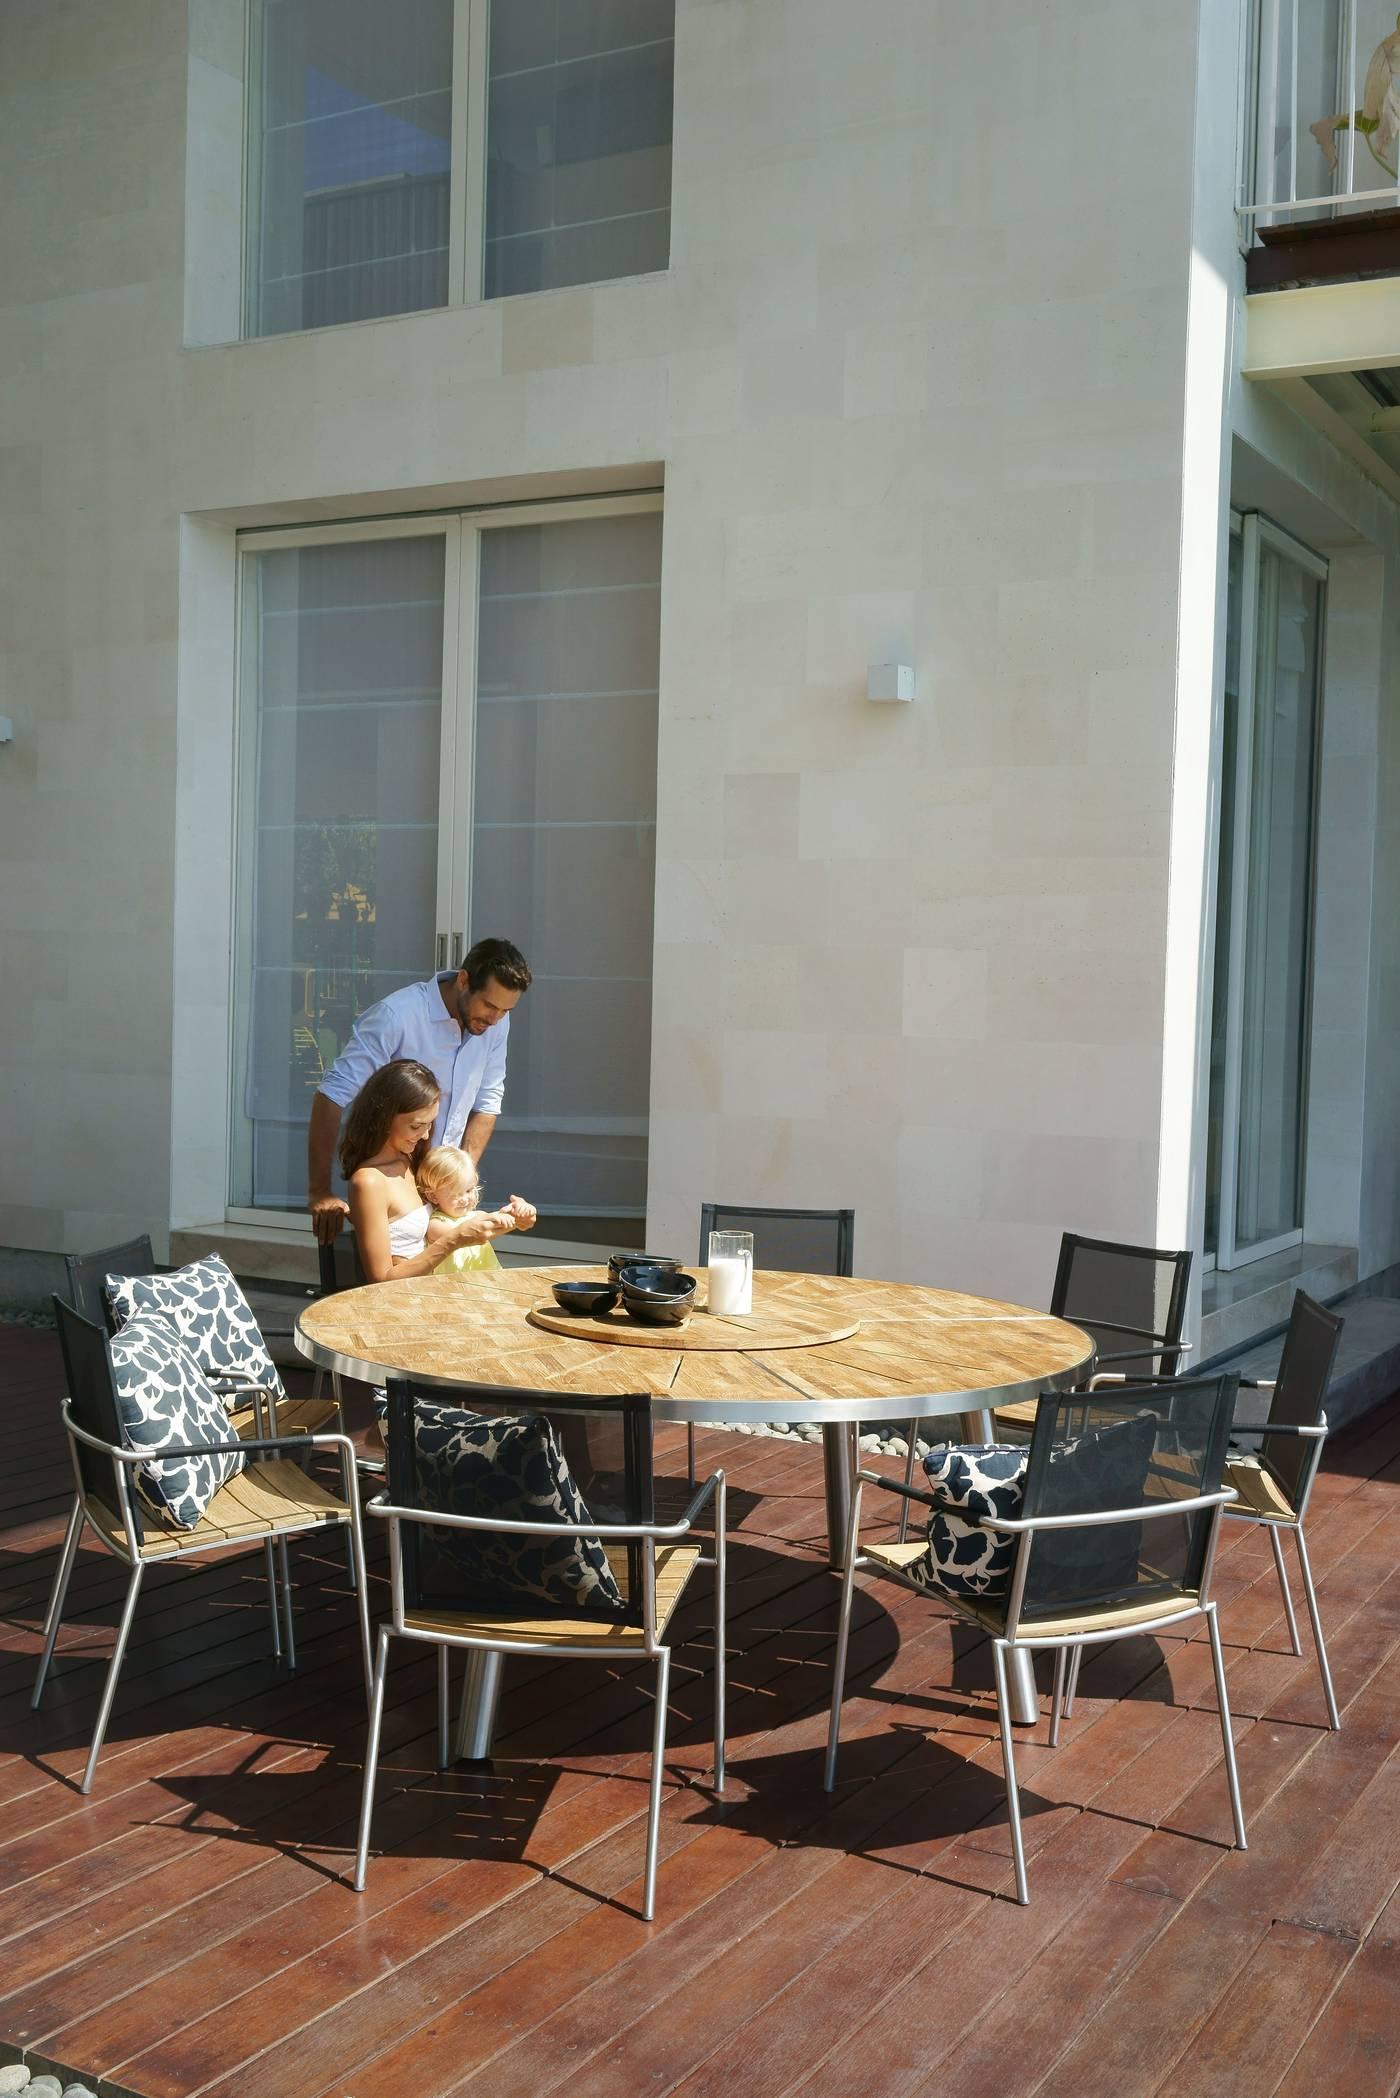 Meika Round Dining Table 180 cm - HPL